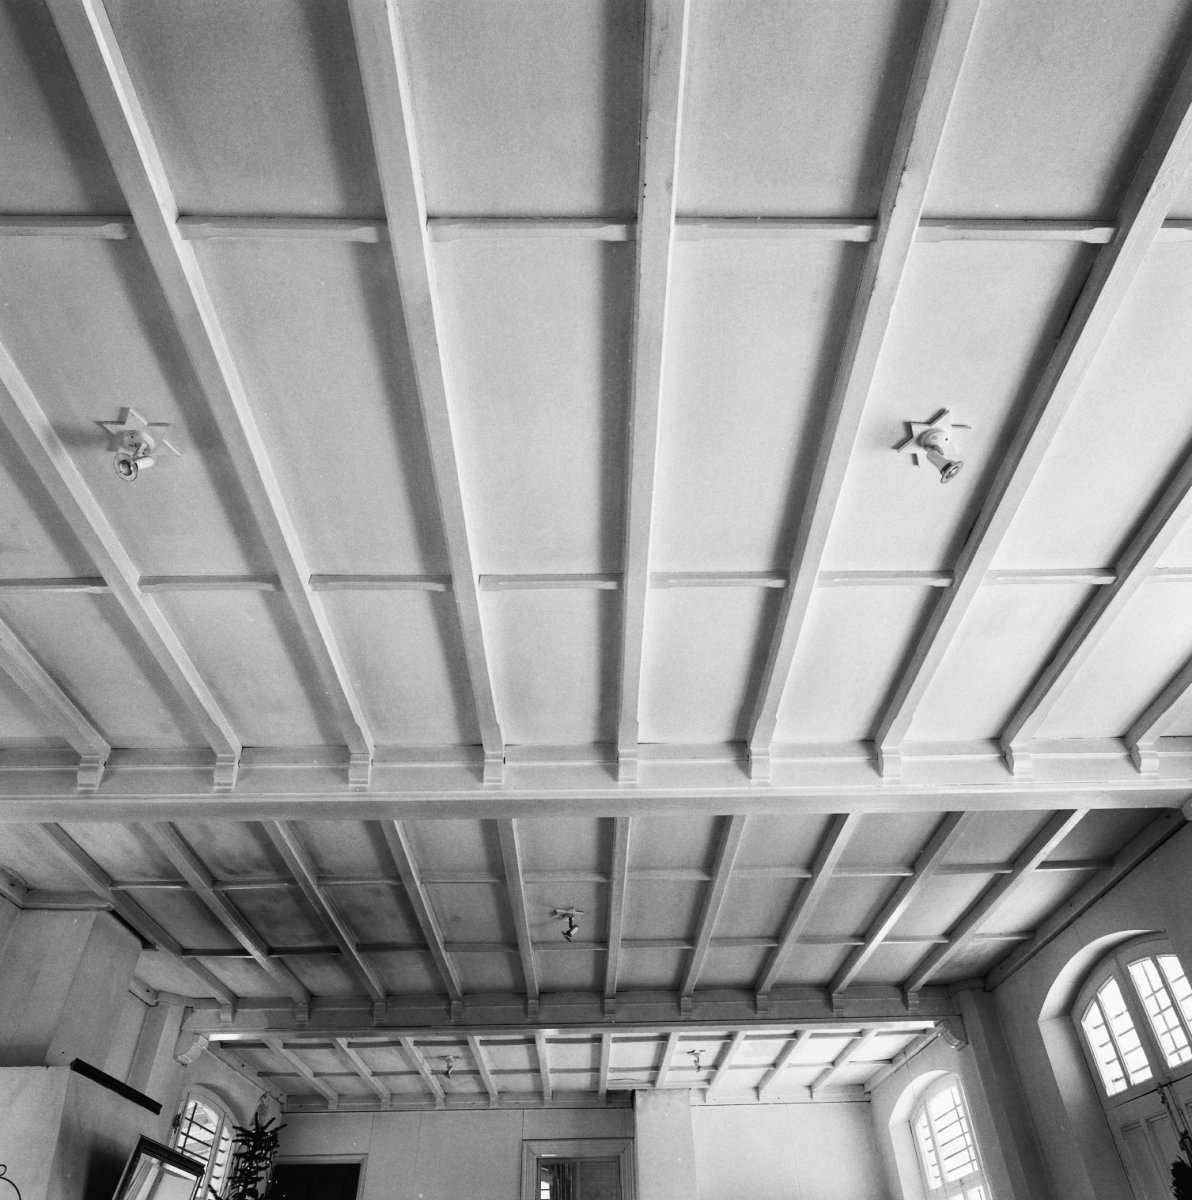 File interieur hoofdgebouw woonkamer plafond 20000218 for Interieur woonkamer